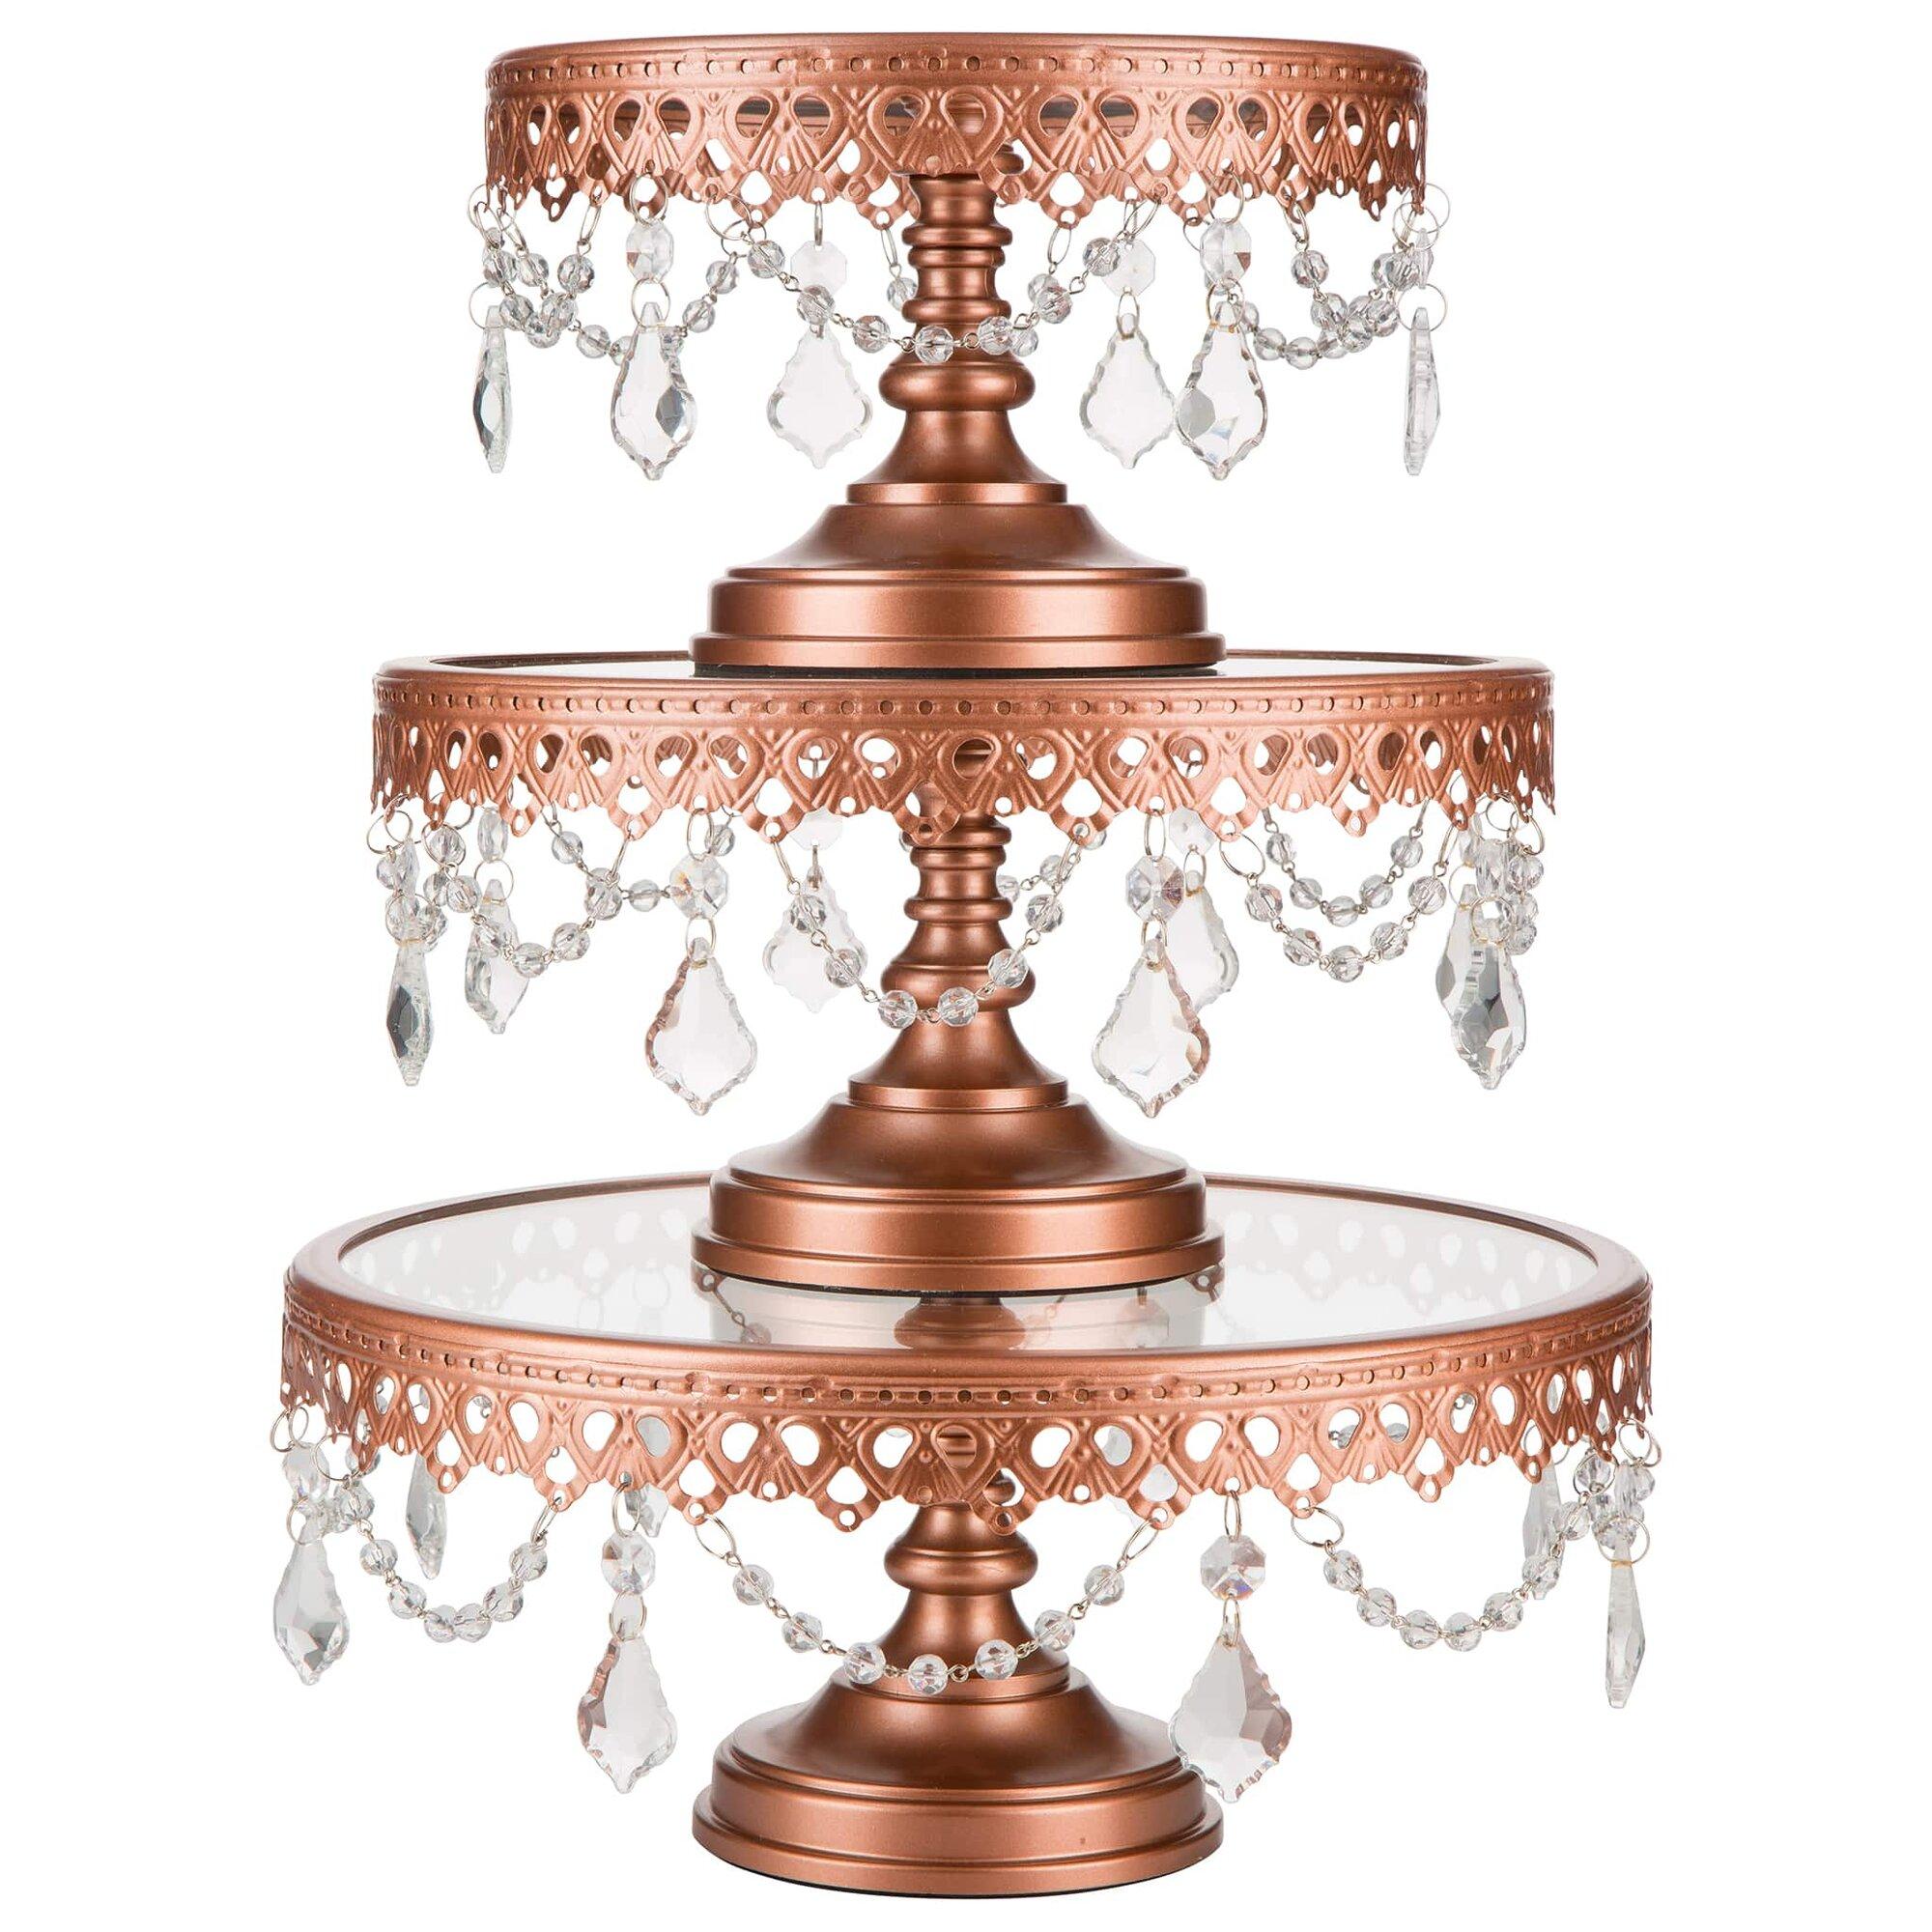 Amalfi decor victoria 3 piece metal cake stand set ebay for Stand decoration